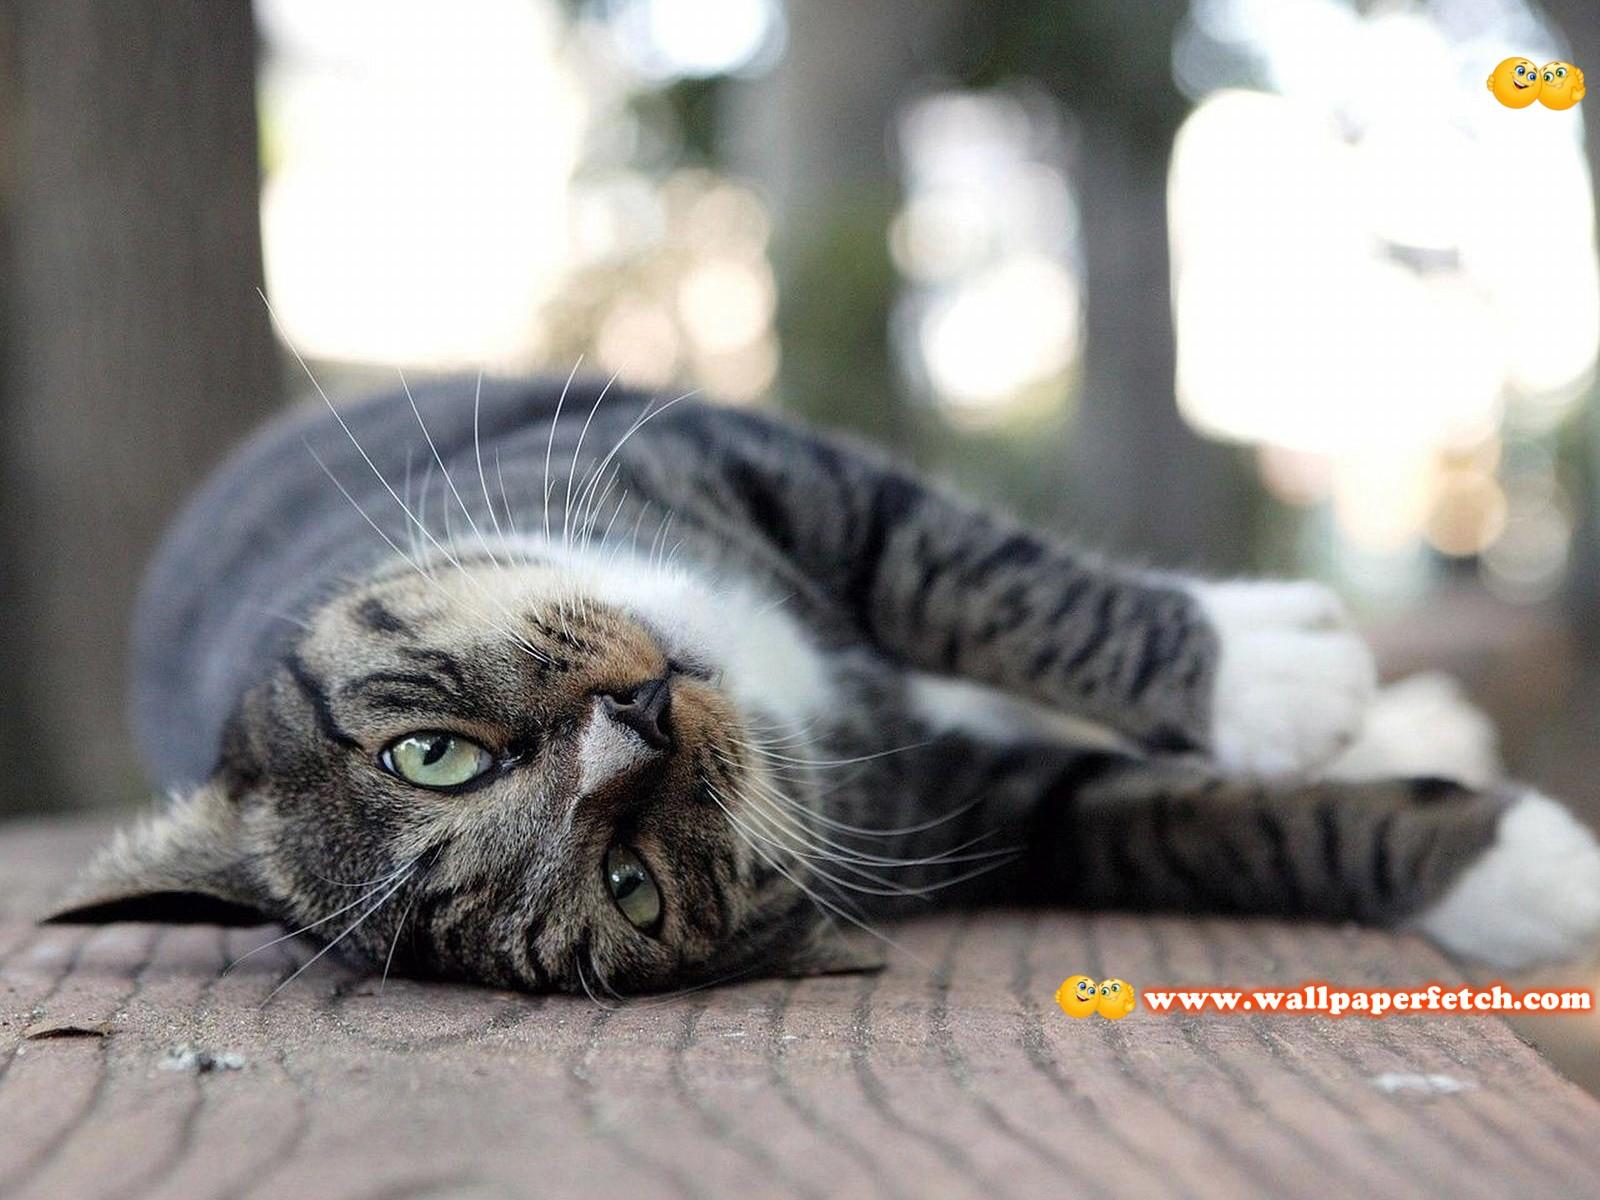 http://1.bp.blogspot.com/-LTKck4Y0jaU/TyFWZ-BKXCI/AAAAAAAAE28/mQo1QyVzews/s1600/SuperPack_Beautiful_Animals_HD_Wallpapers_Part_32.44.jpg